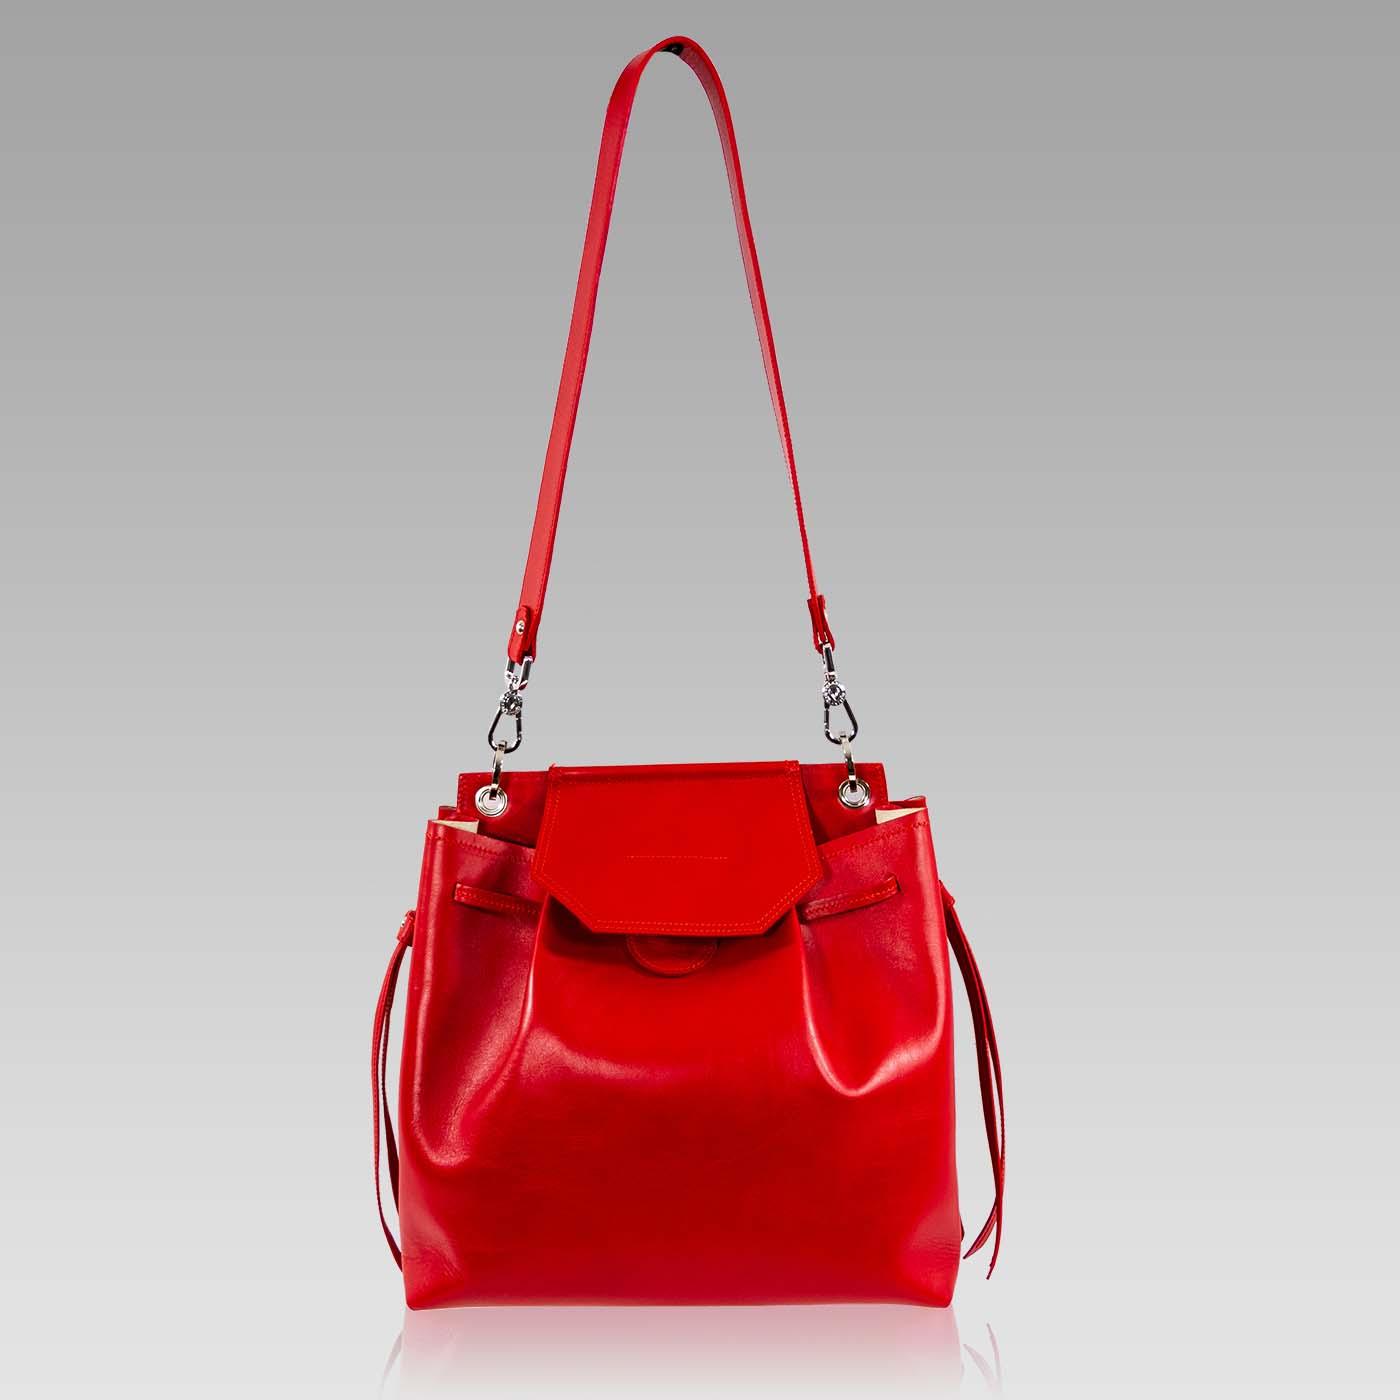 Valentino_Orlandi_Purse_Scarlet_Red_Leather_Drawstring_Crossbody_Bag_01VO6184GLRD_01.jpg